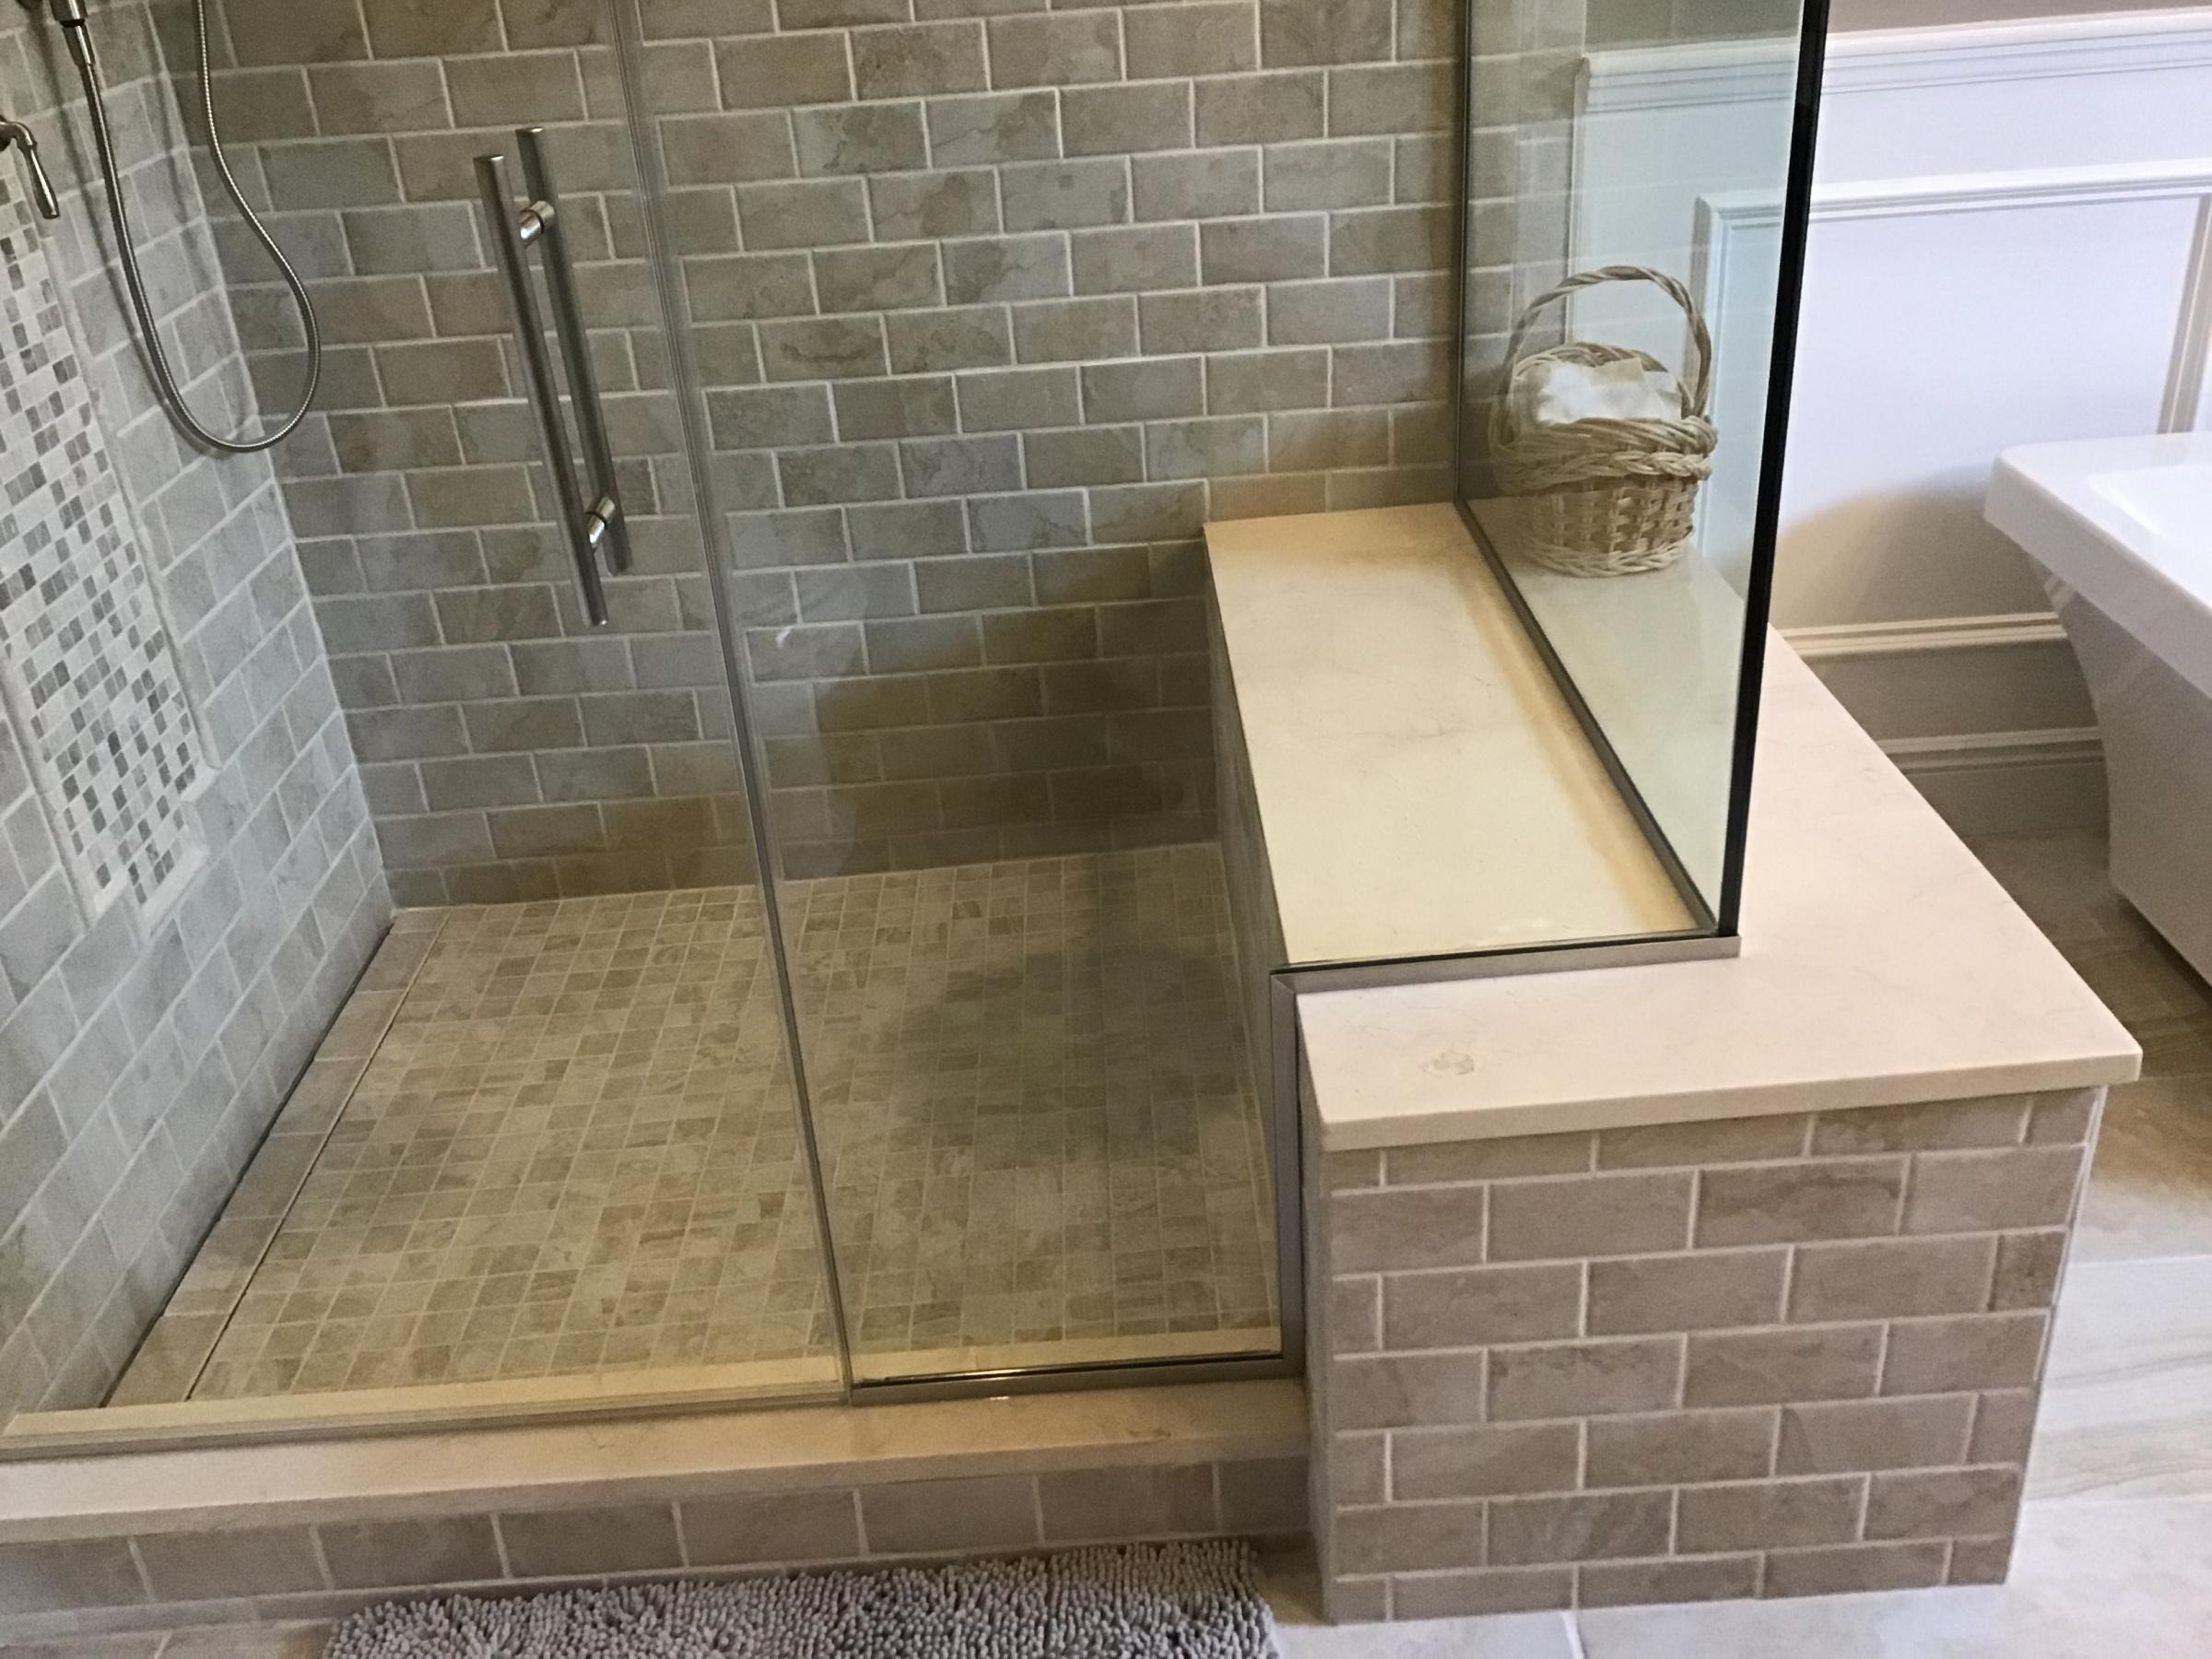 master bath in progress-3bf294b5-0f38-41e1-b355-db10e7e98c05.jpg